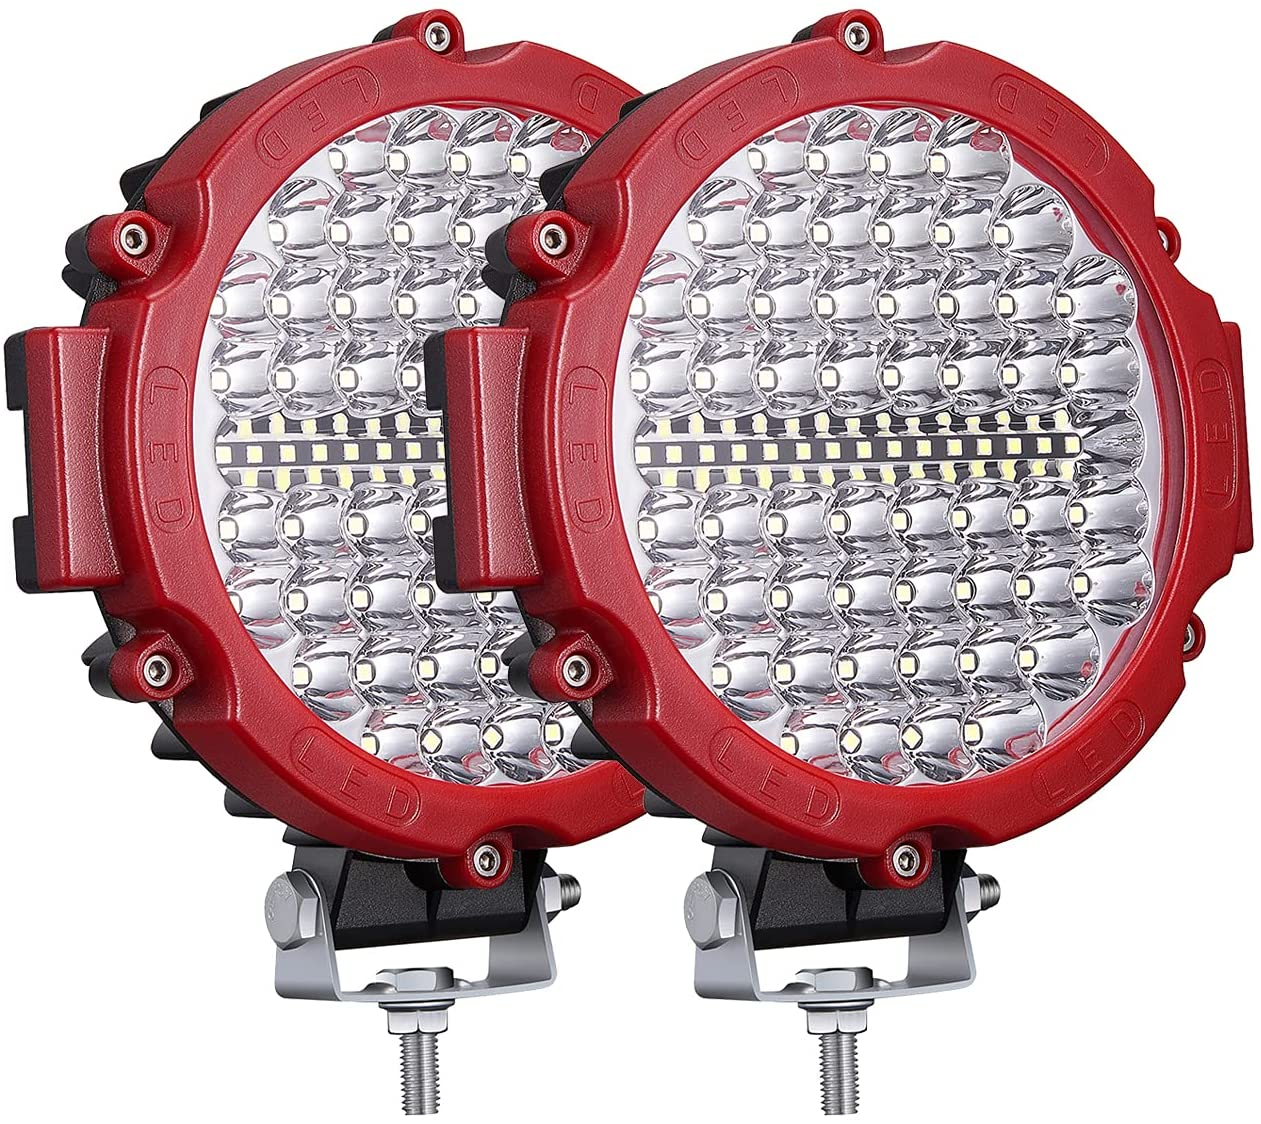 2pcs 7 inch Round LED Off Road Lights Truck 10-60V 4x4 Driving Light Pods 210W Super Bright Off-road for ATV UTV SUV Car Boat